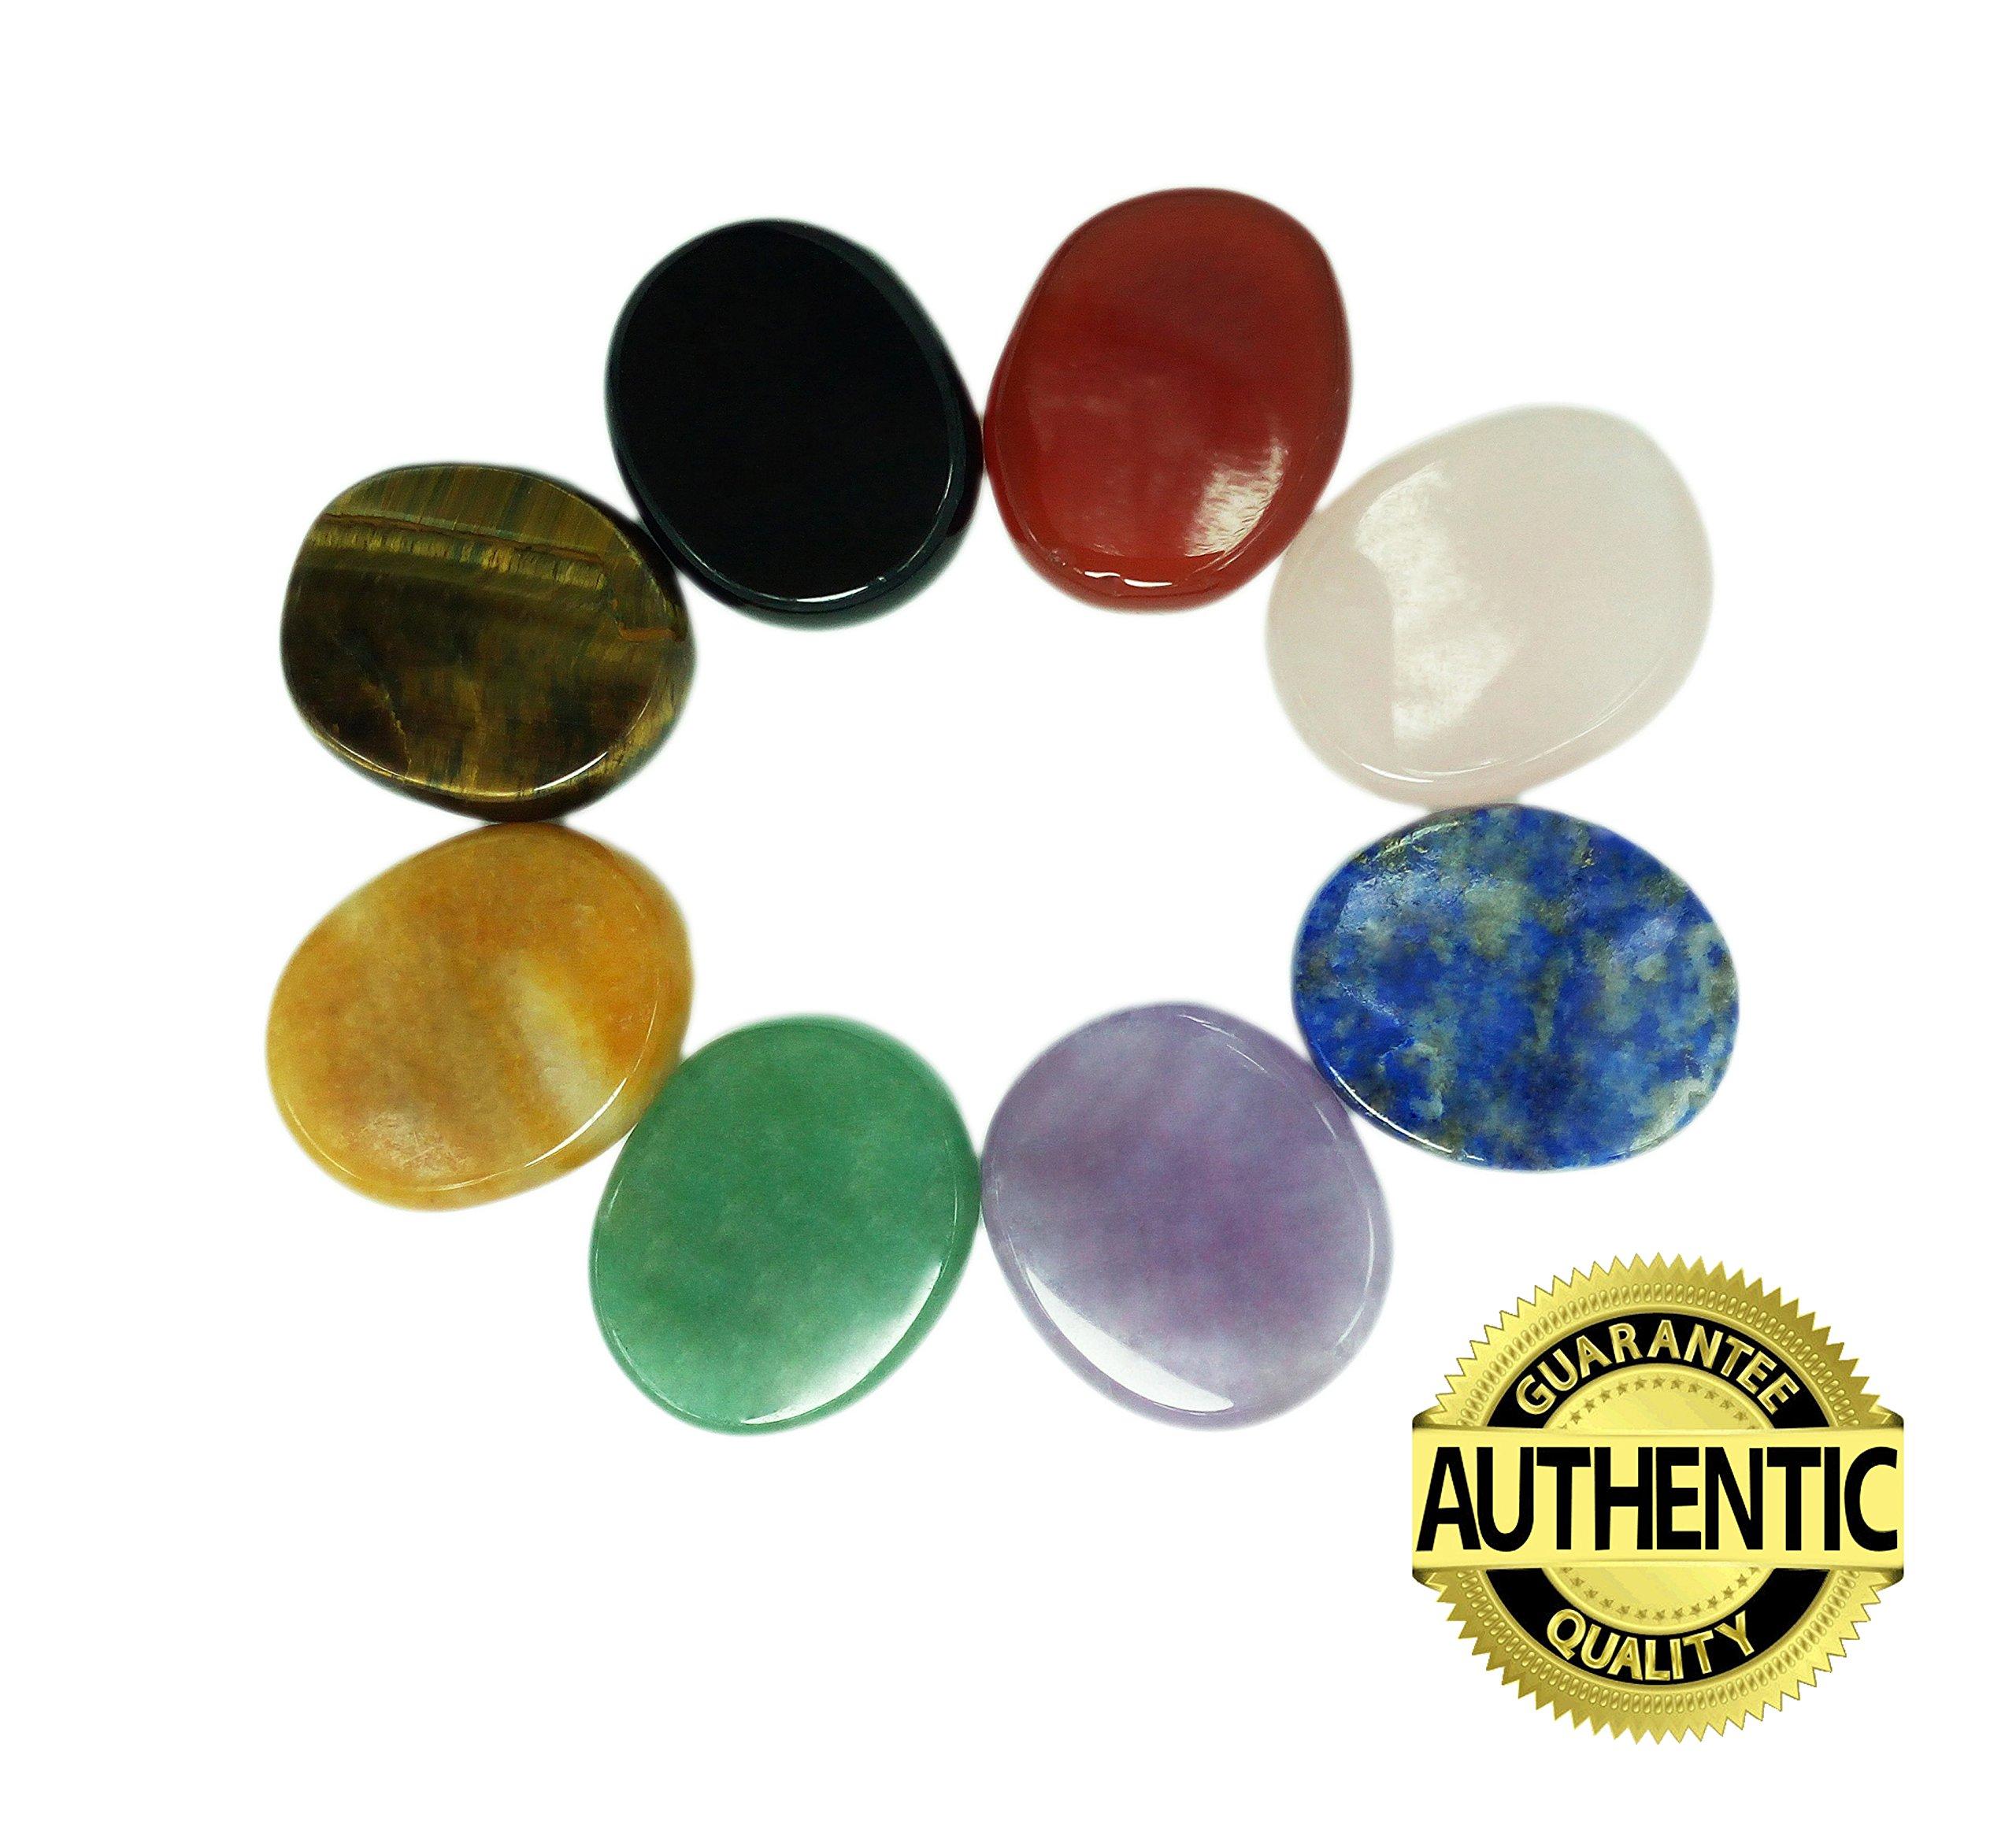 Chakra Stones 8 PCS Kit, Oval Shaped, For Crystal Healing Meditation, Reiki or As Worry Stones or Palm Thumb Pocket Stones (Set of 8 Oval Shape Chakra Stones)